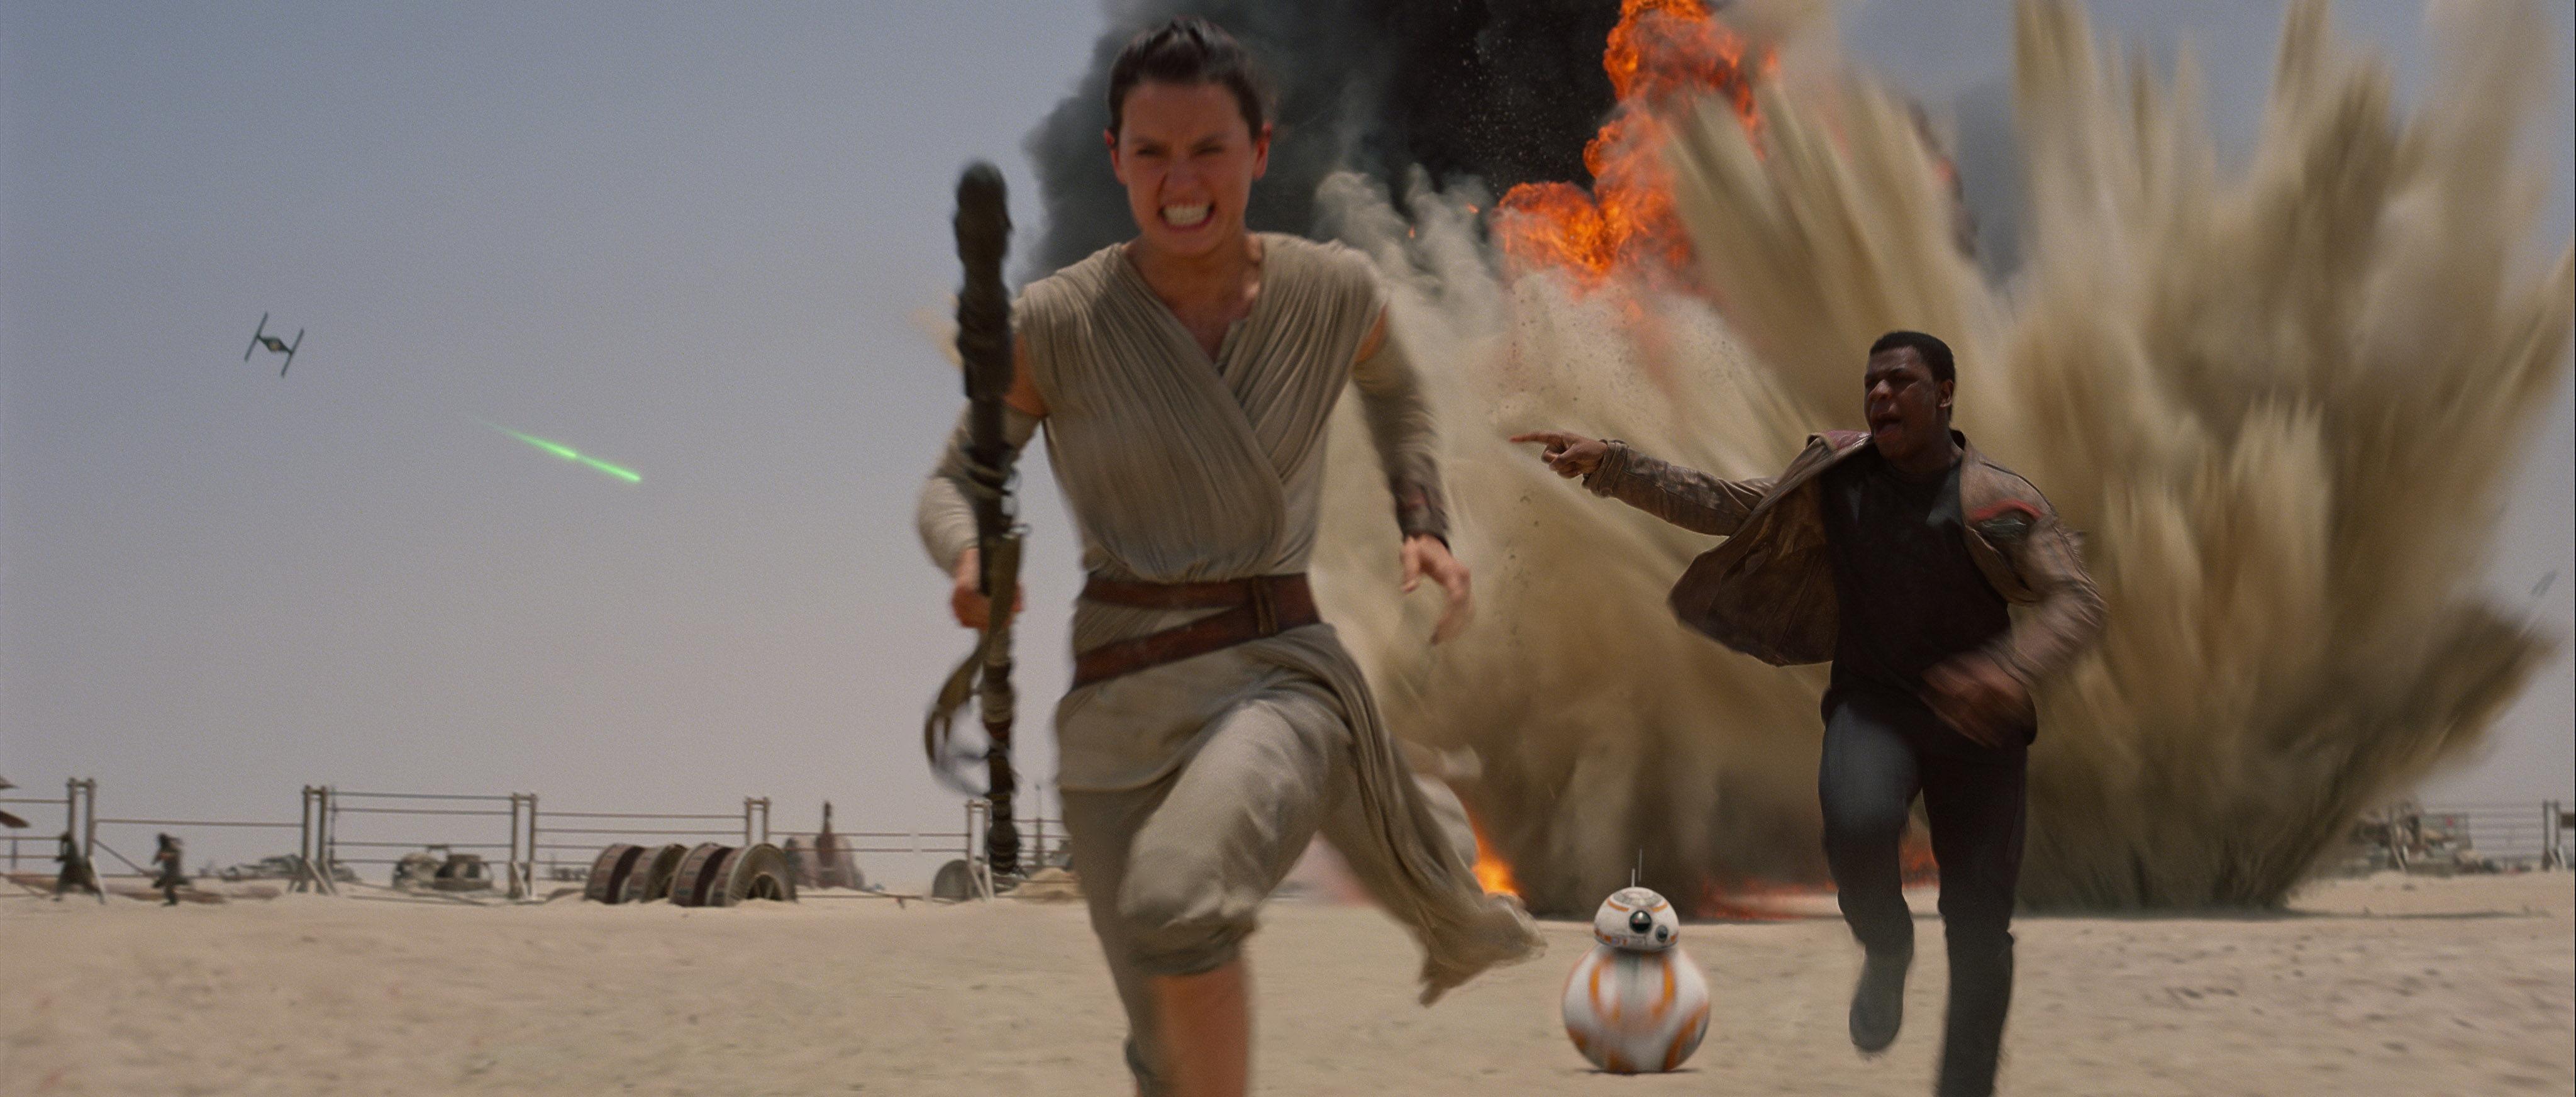 Finn Rey Explosions Wide 570x242 Star Wars The Force Awakens Finn 4096x1744